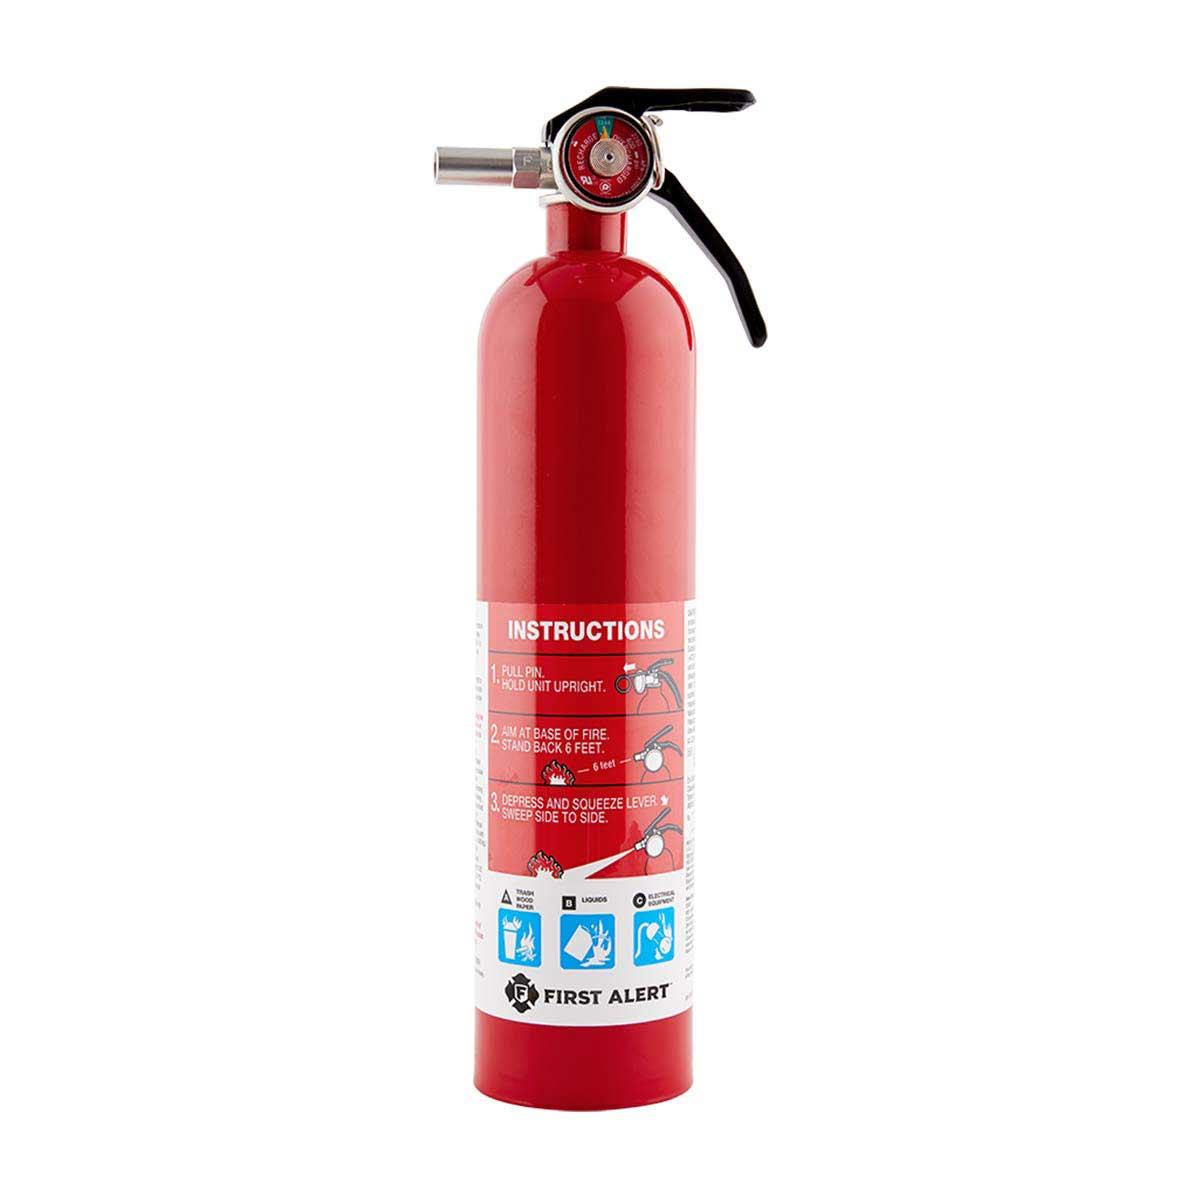 First Alert Standard home Fire Extinguisher